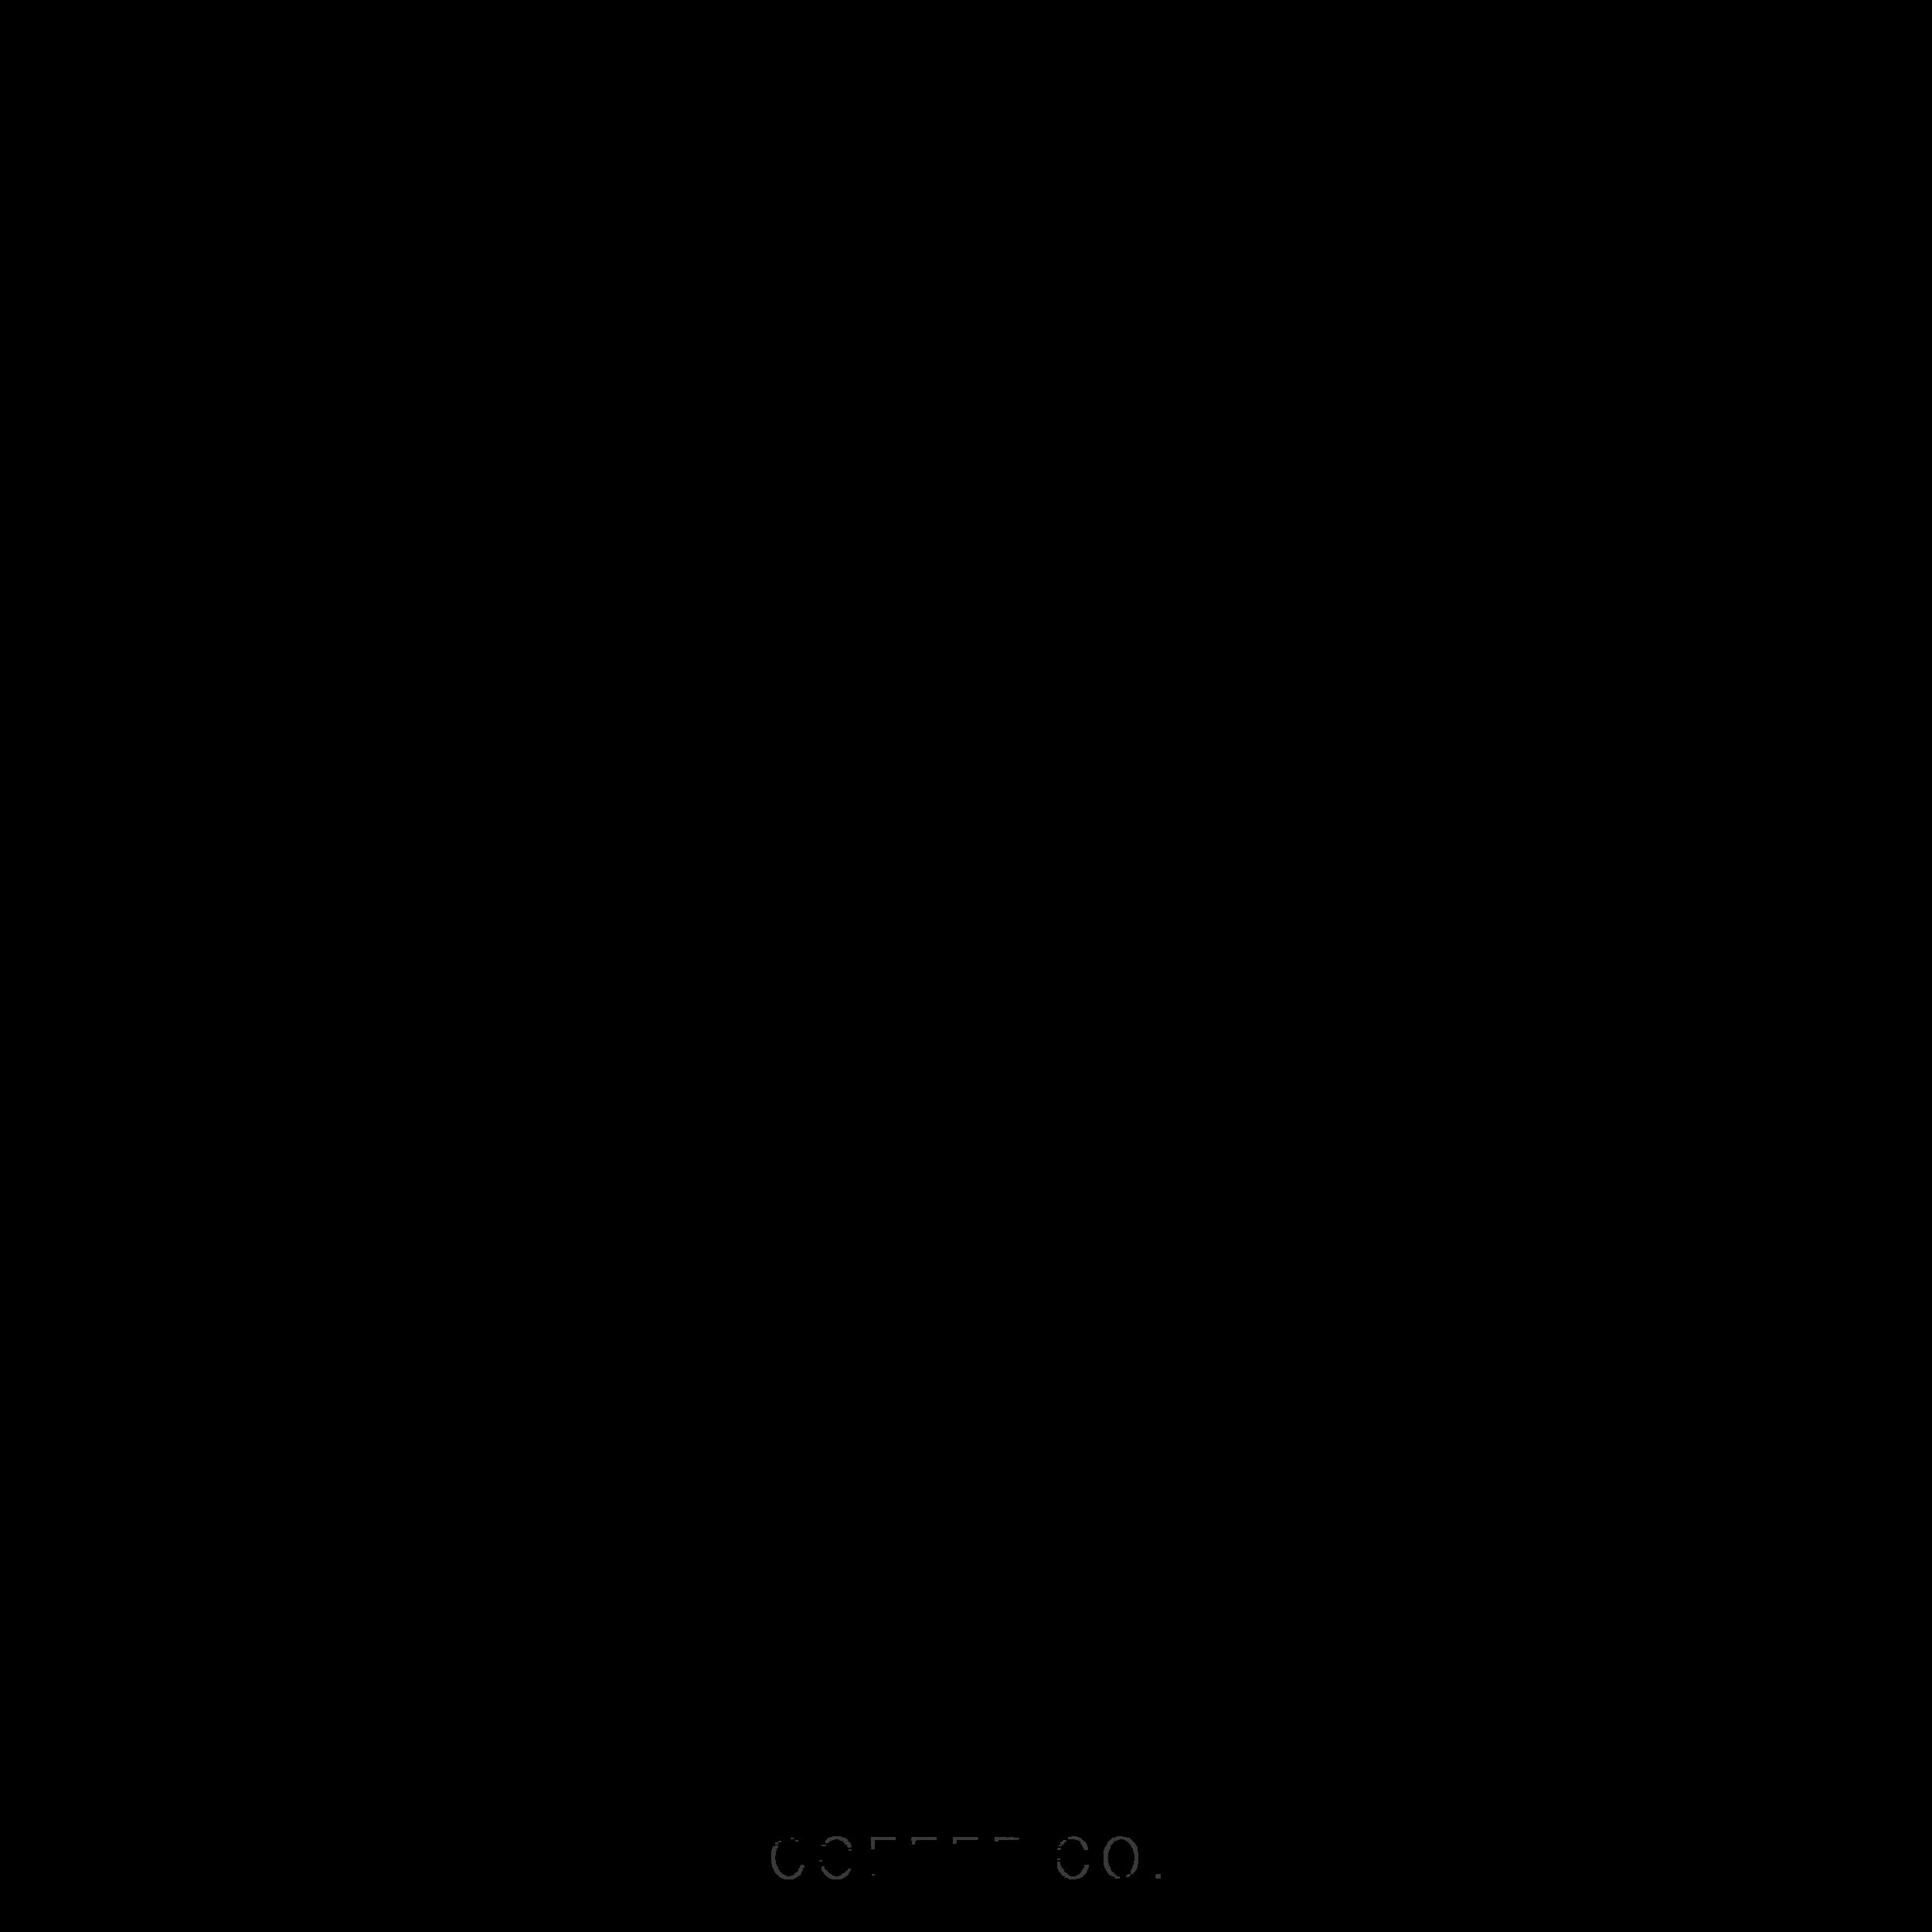 FH-Black-Transparent-HiRes2.png